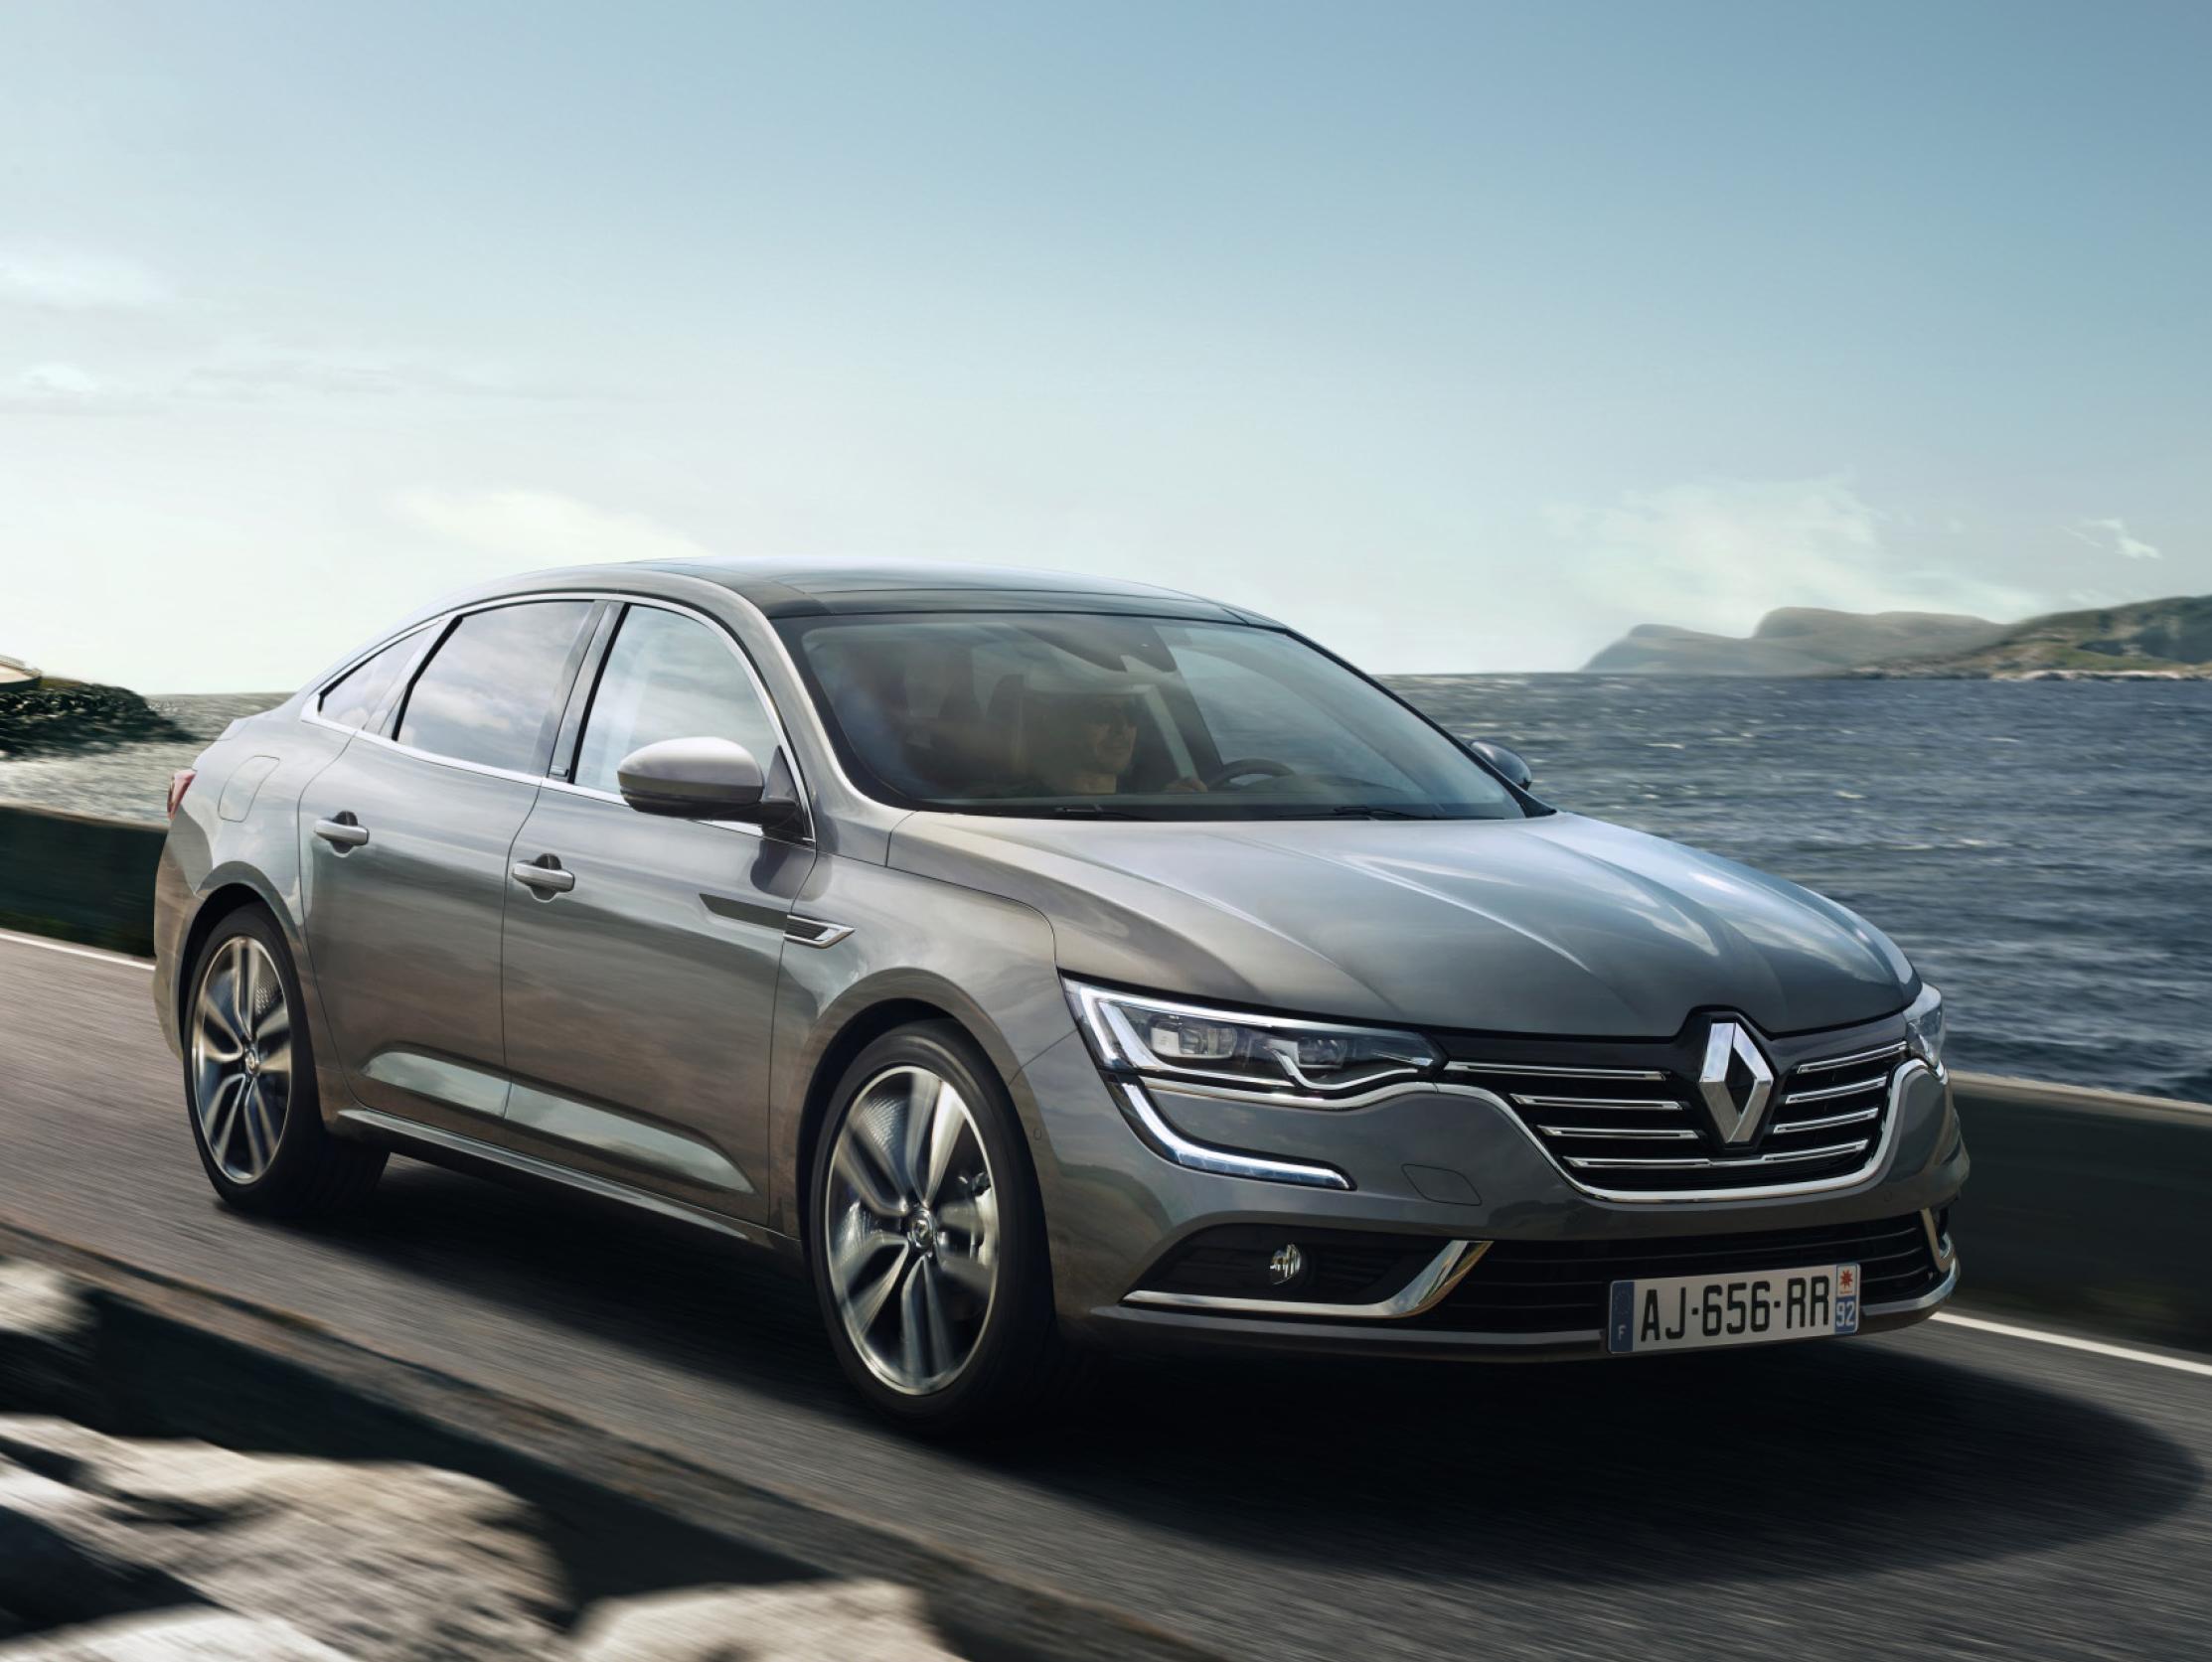 Renault reveals new Talisman saloon